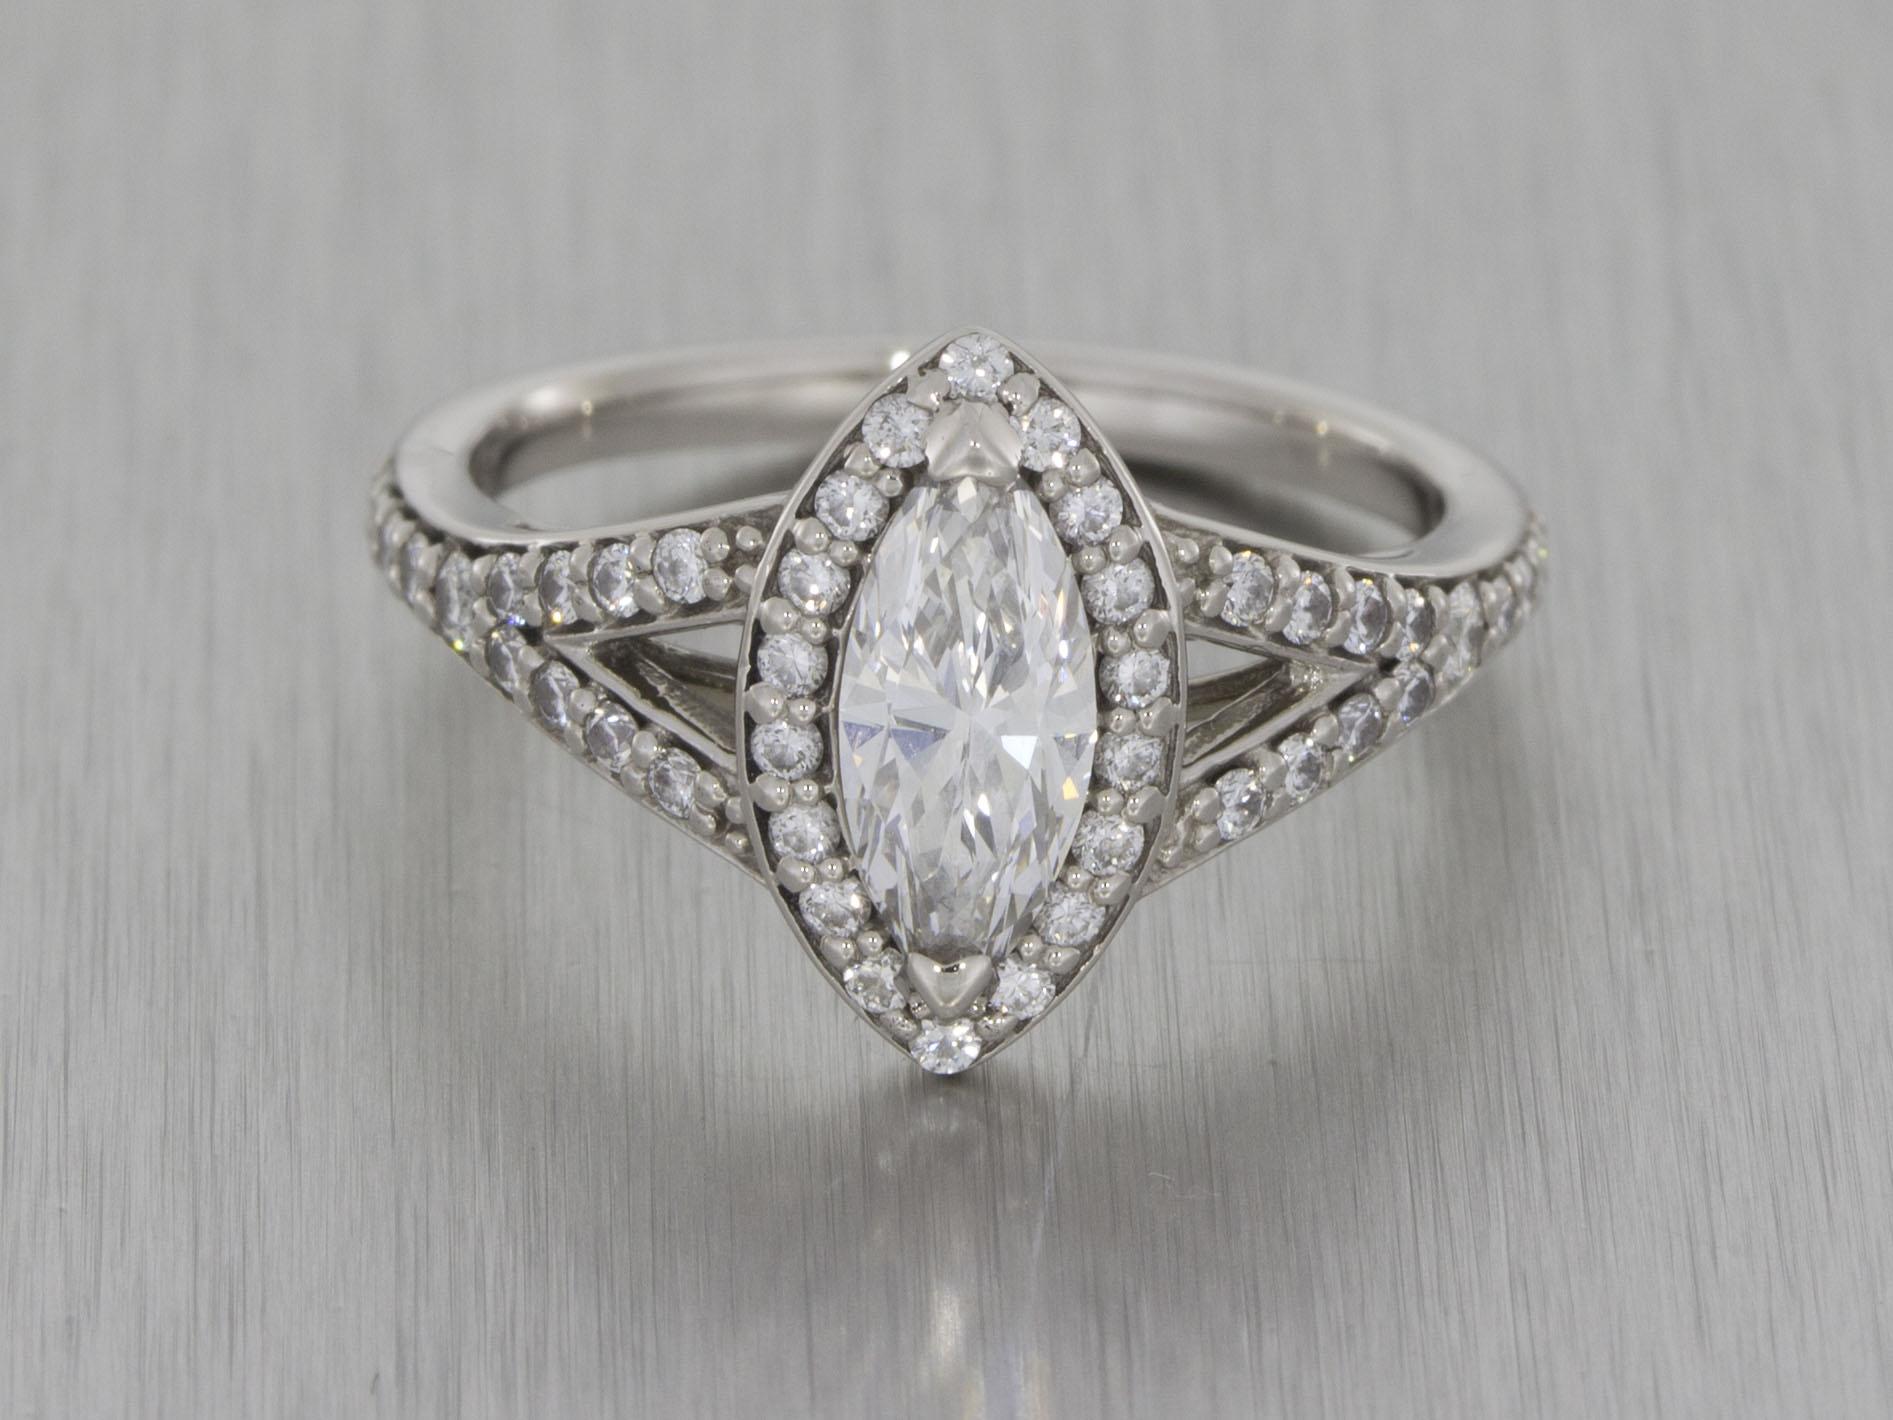 Stunning Split Shank Marquise Diamond Halo Ring With Matching Wedding Band